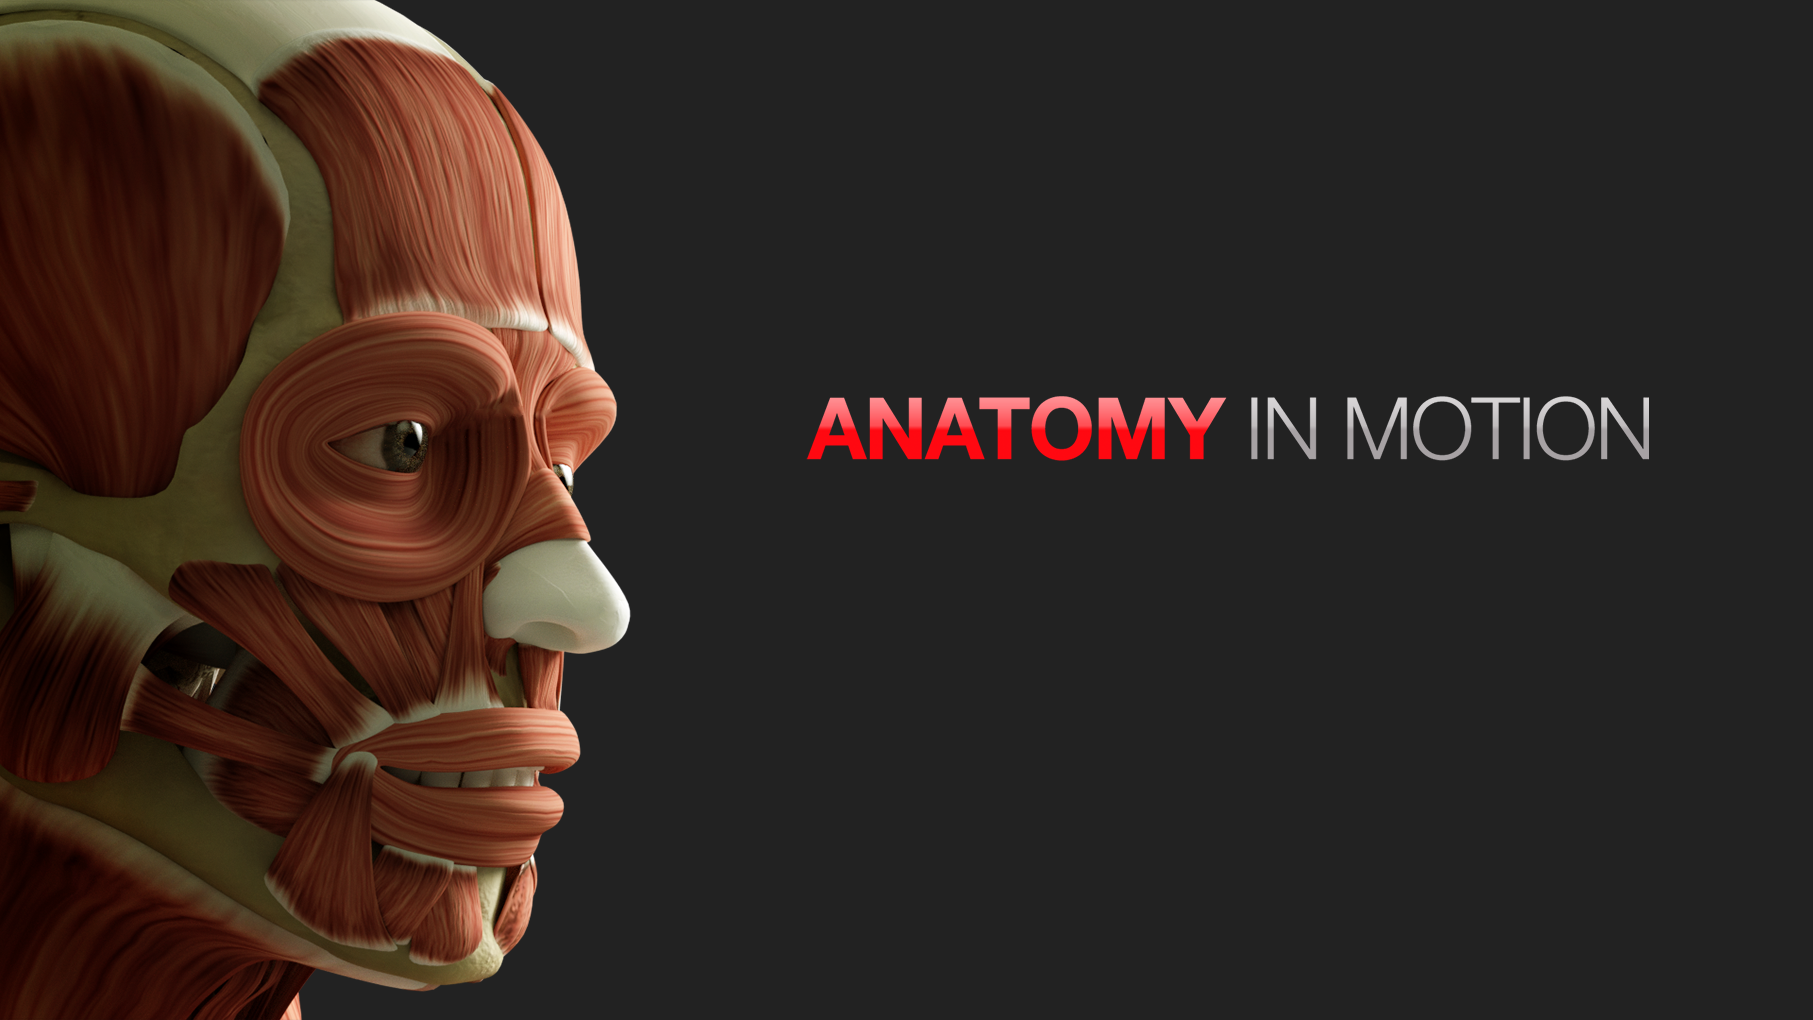 Jacob Berrier - Anatomy In Motion